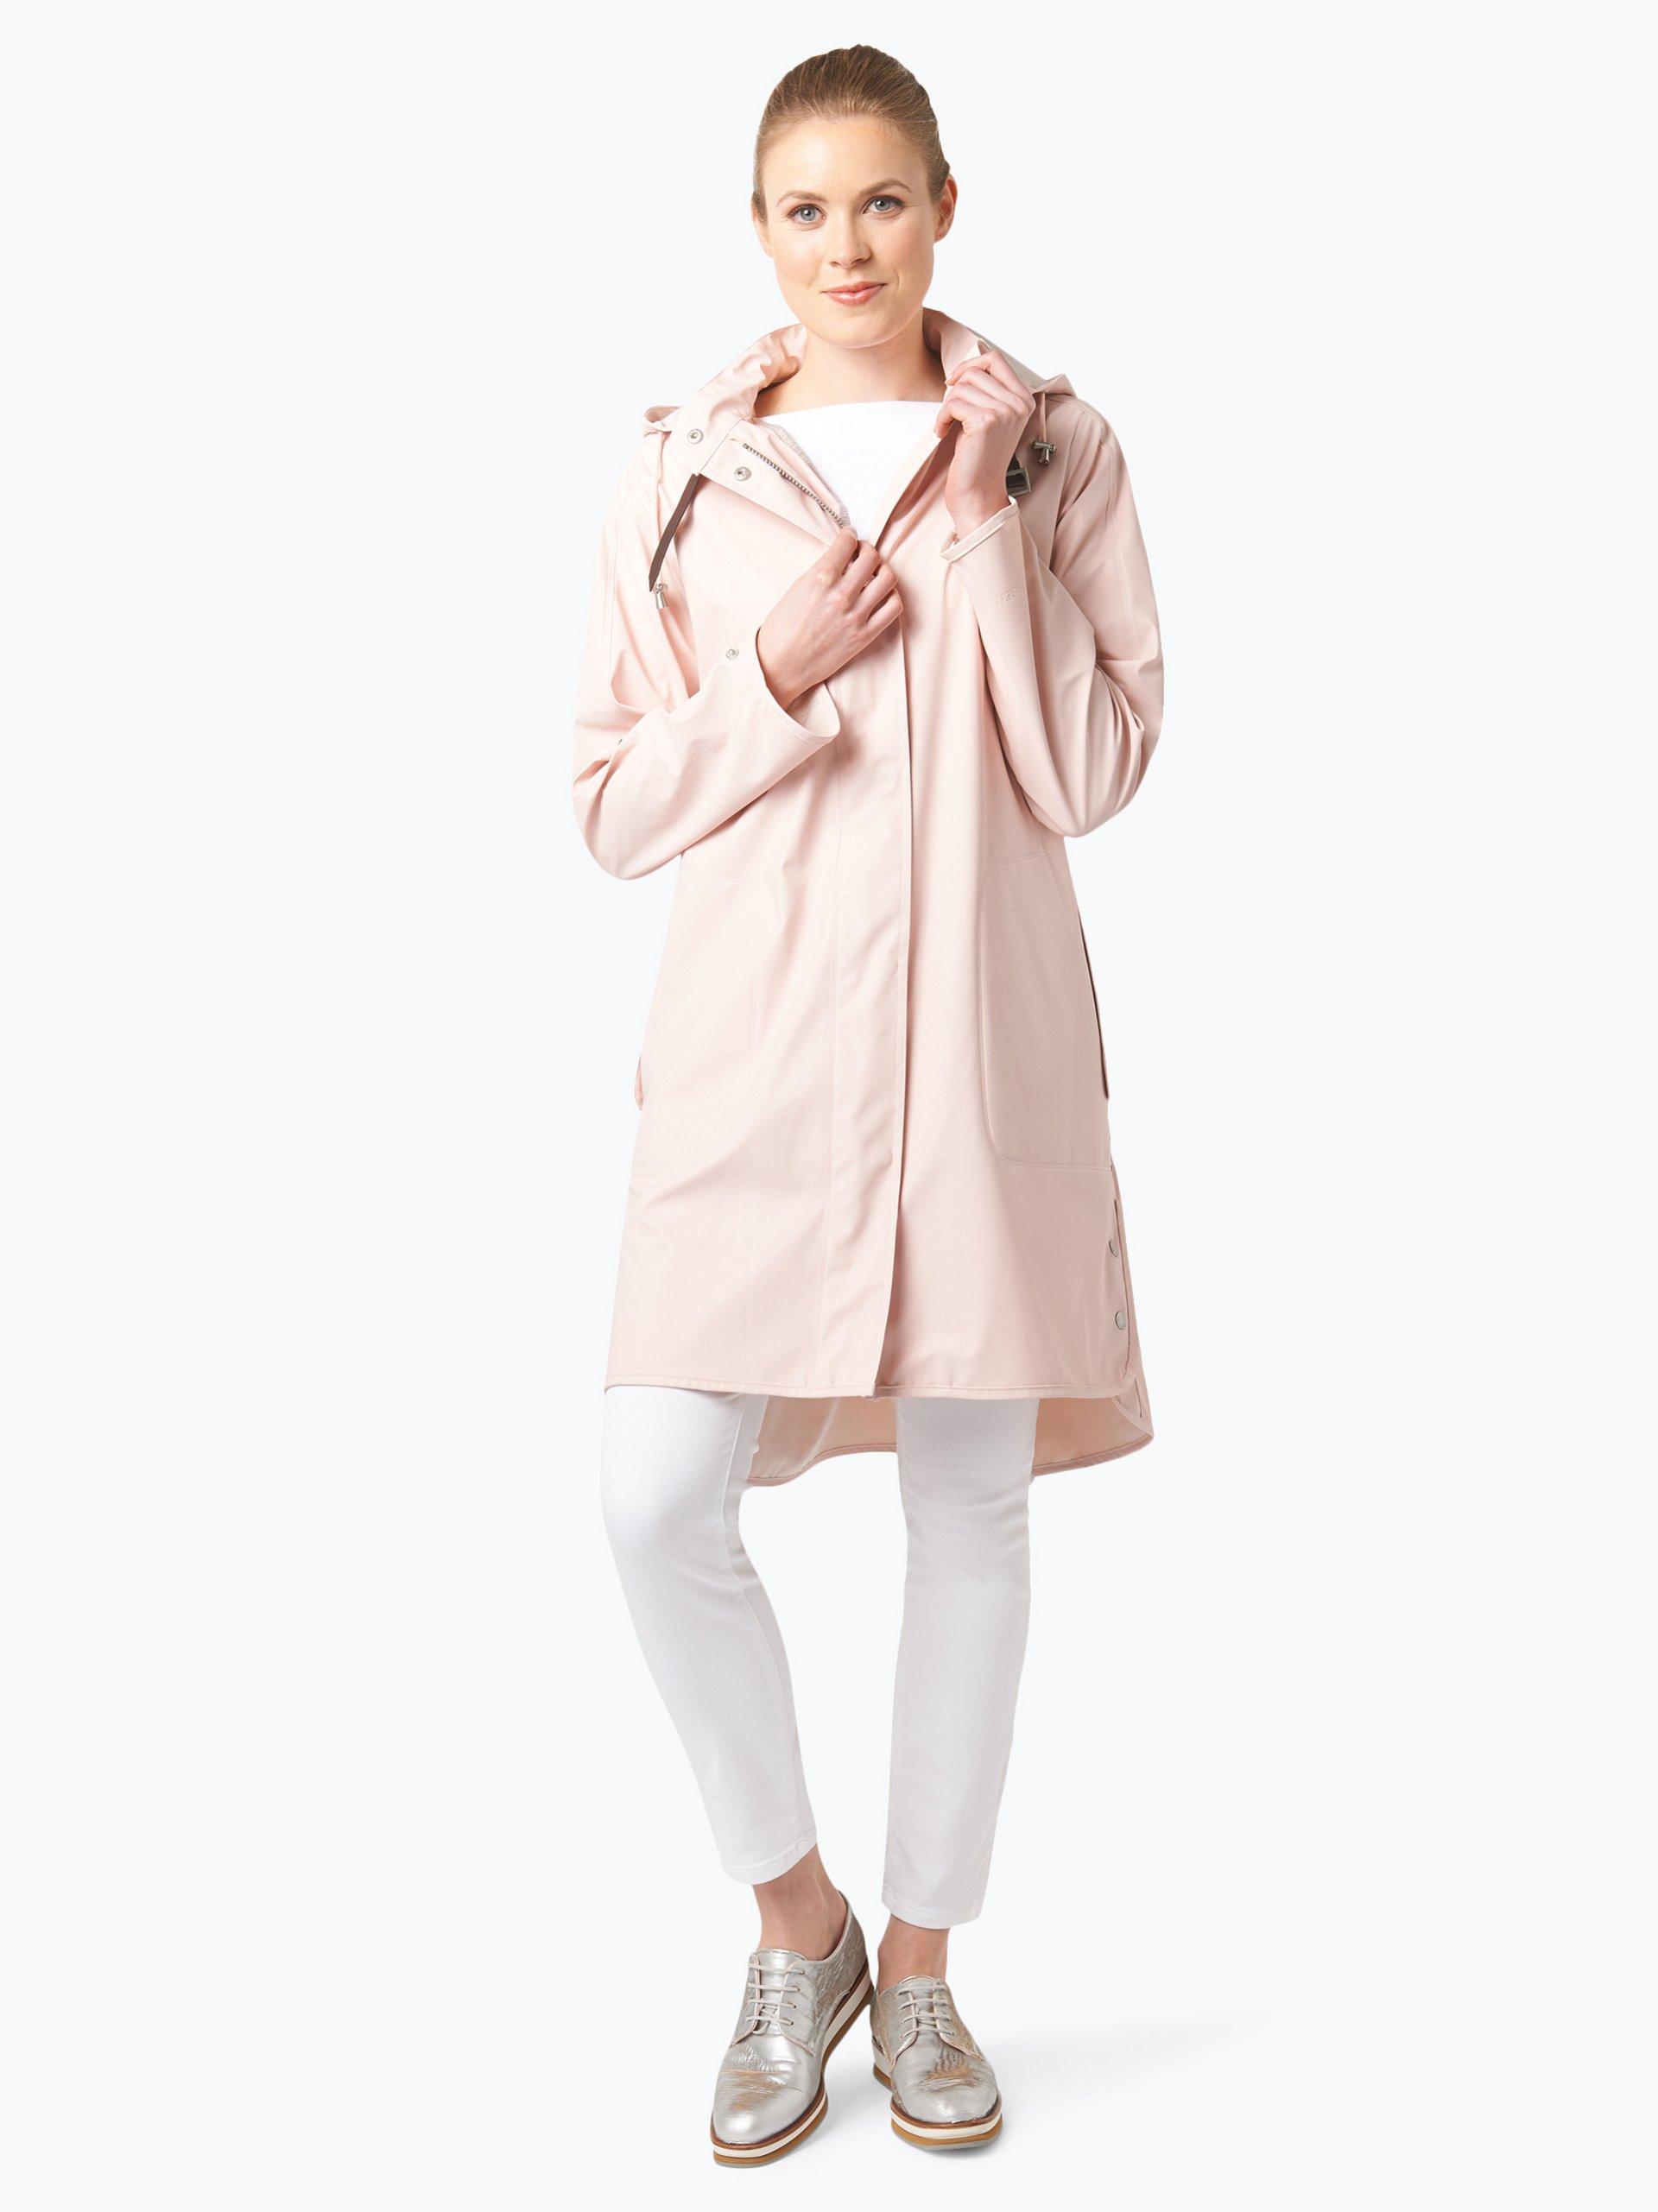 ilse jacobsen damen mantel rain71 rosa uni online kaufen peek und cloppenburg de. Black Bedroom Furniture Sets. Home Design Ideas